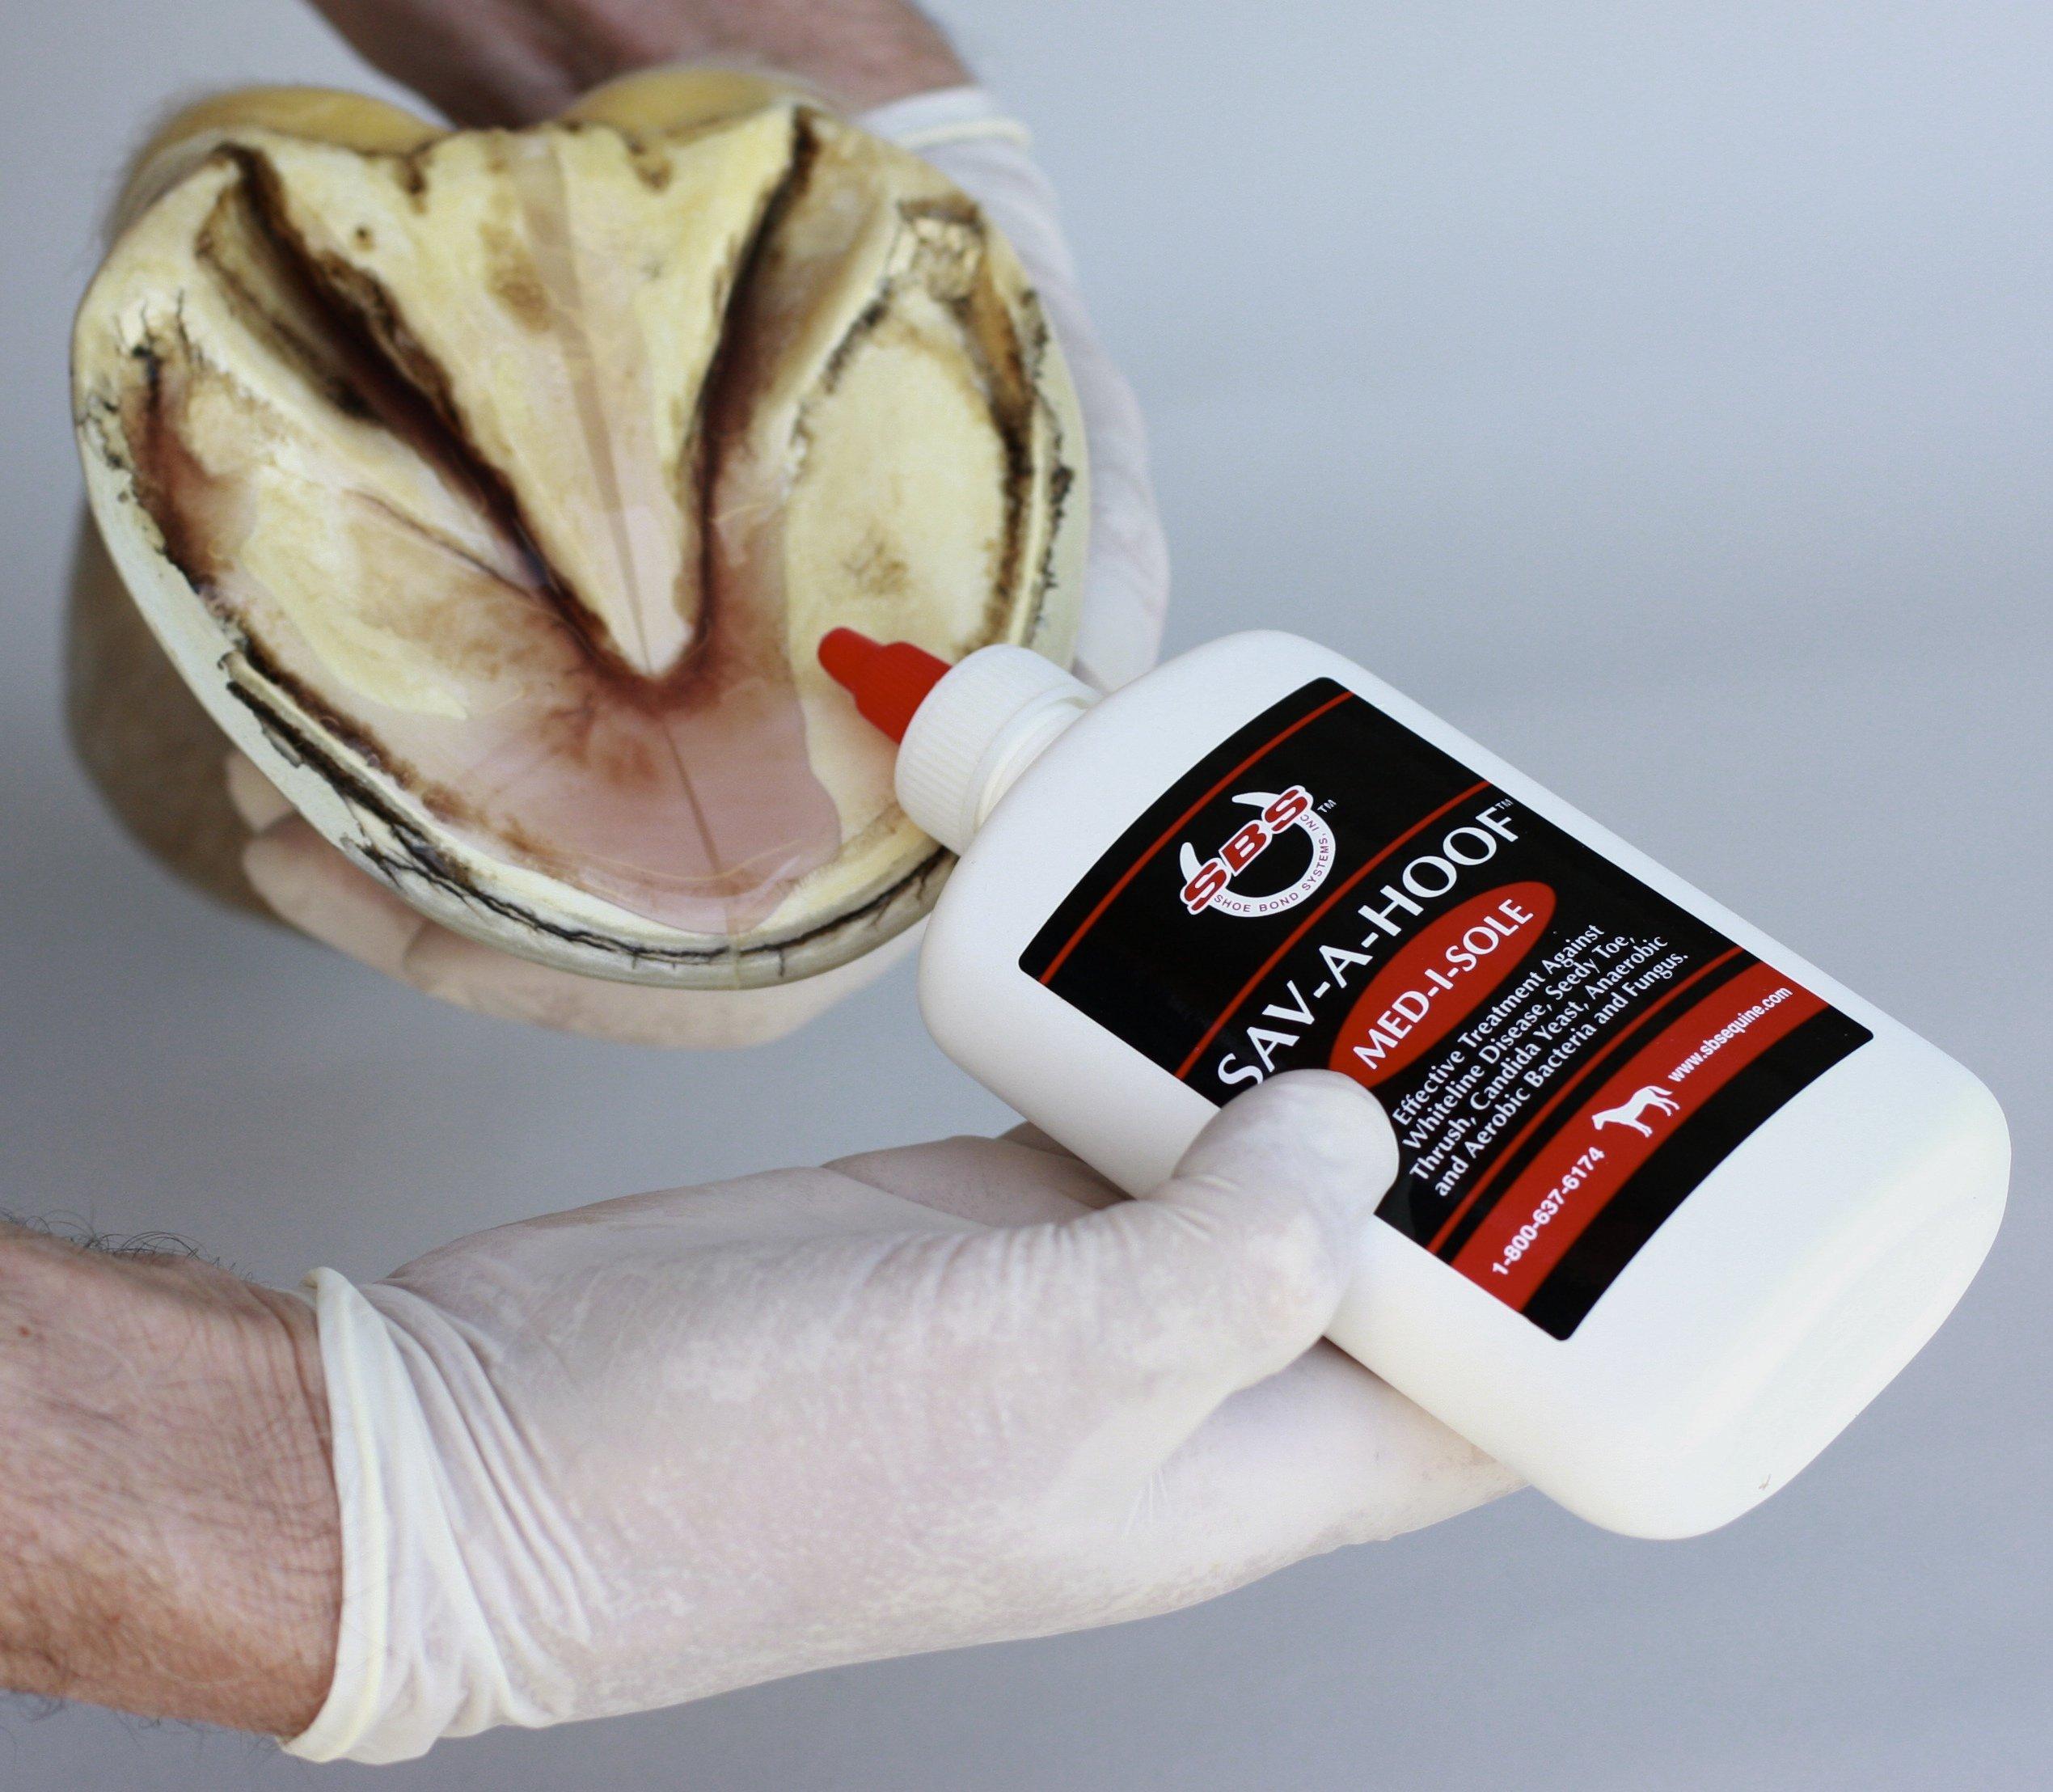 SBS Equine Item 310 hoof Treatment, 10 oz Squeeze Bottle by SBS EQUINE Sav-A-Hoof Med-i-sole, Item 310, 10 oz gel